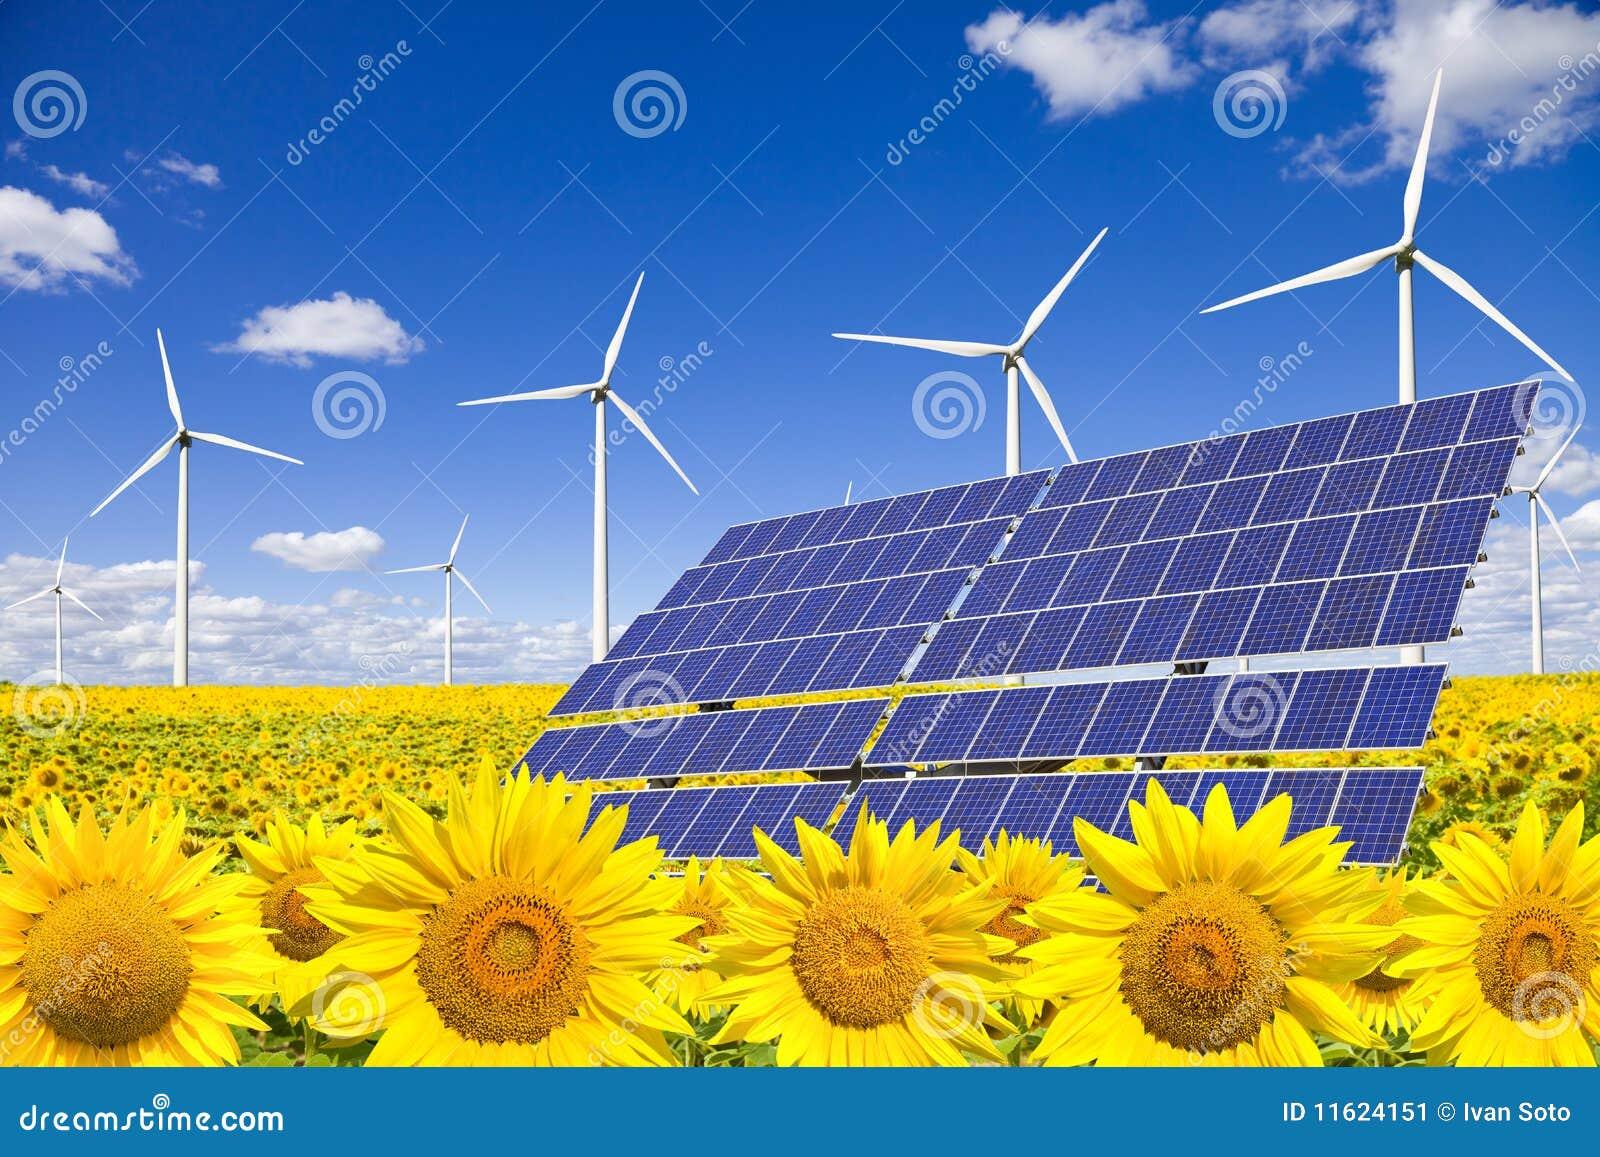 Wind Turbines And Solar Panels On Sunflowers Field Stock Image Image 11624151